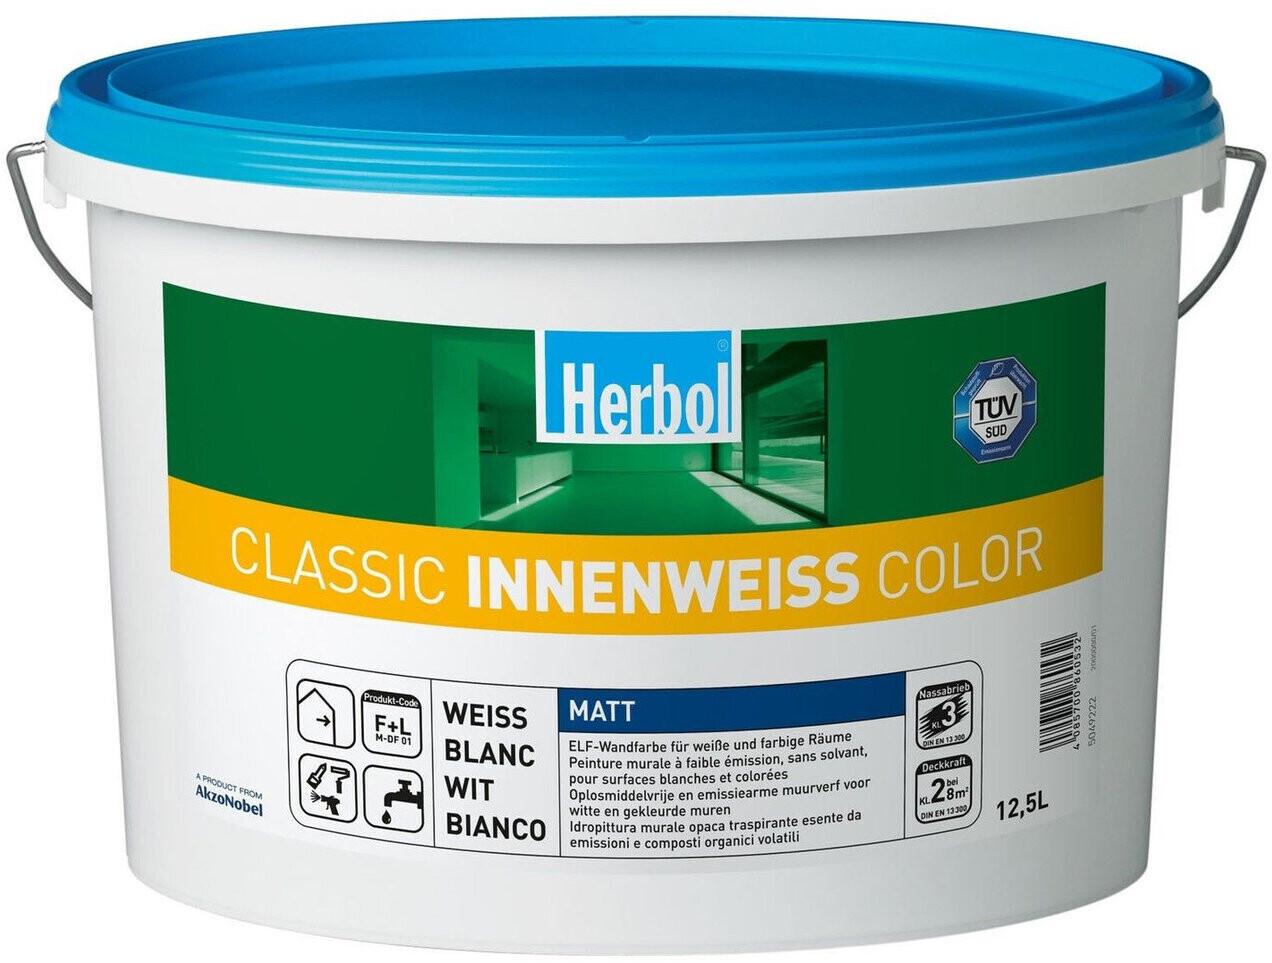 Herbol Herbol Classic Innenweiss 12,5l